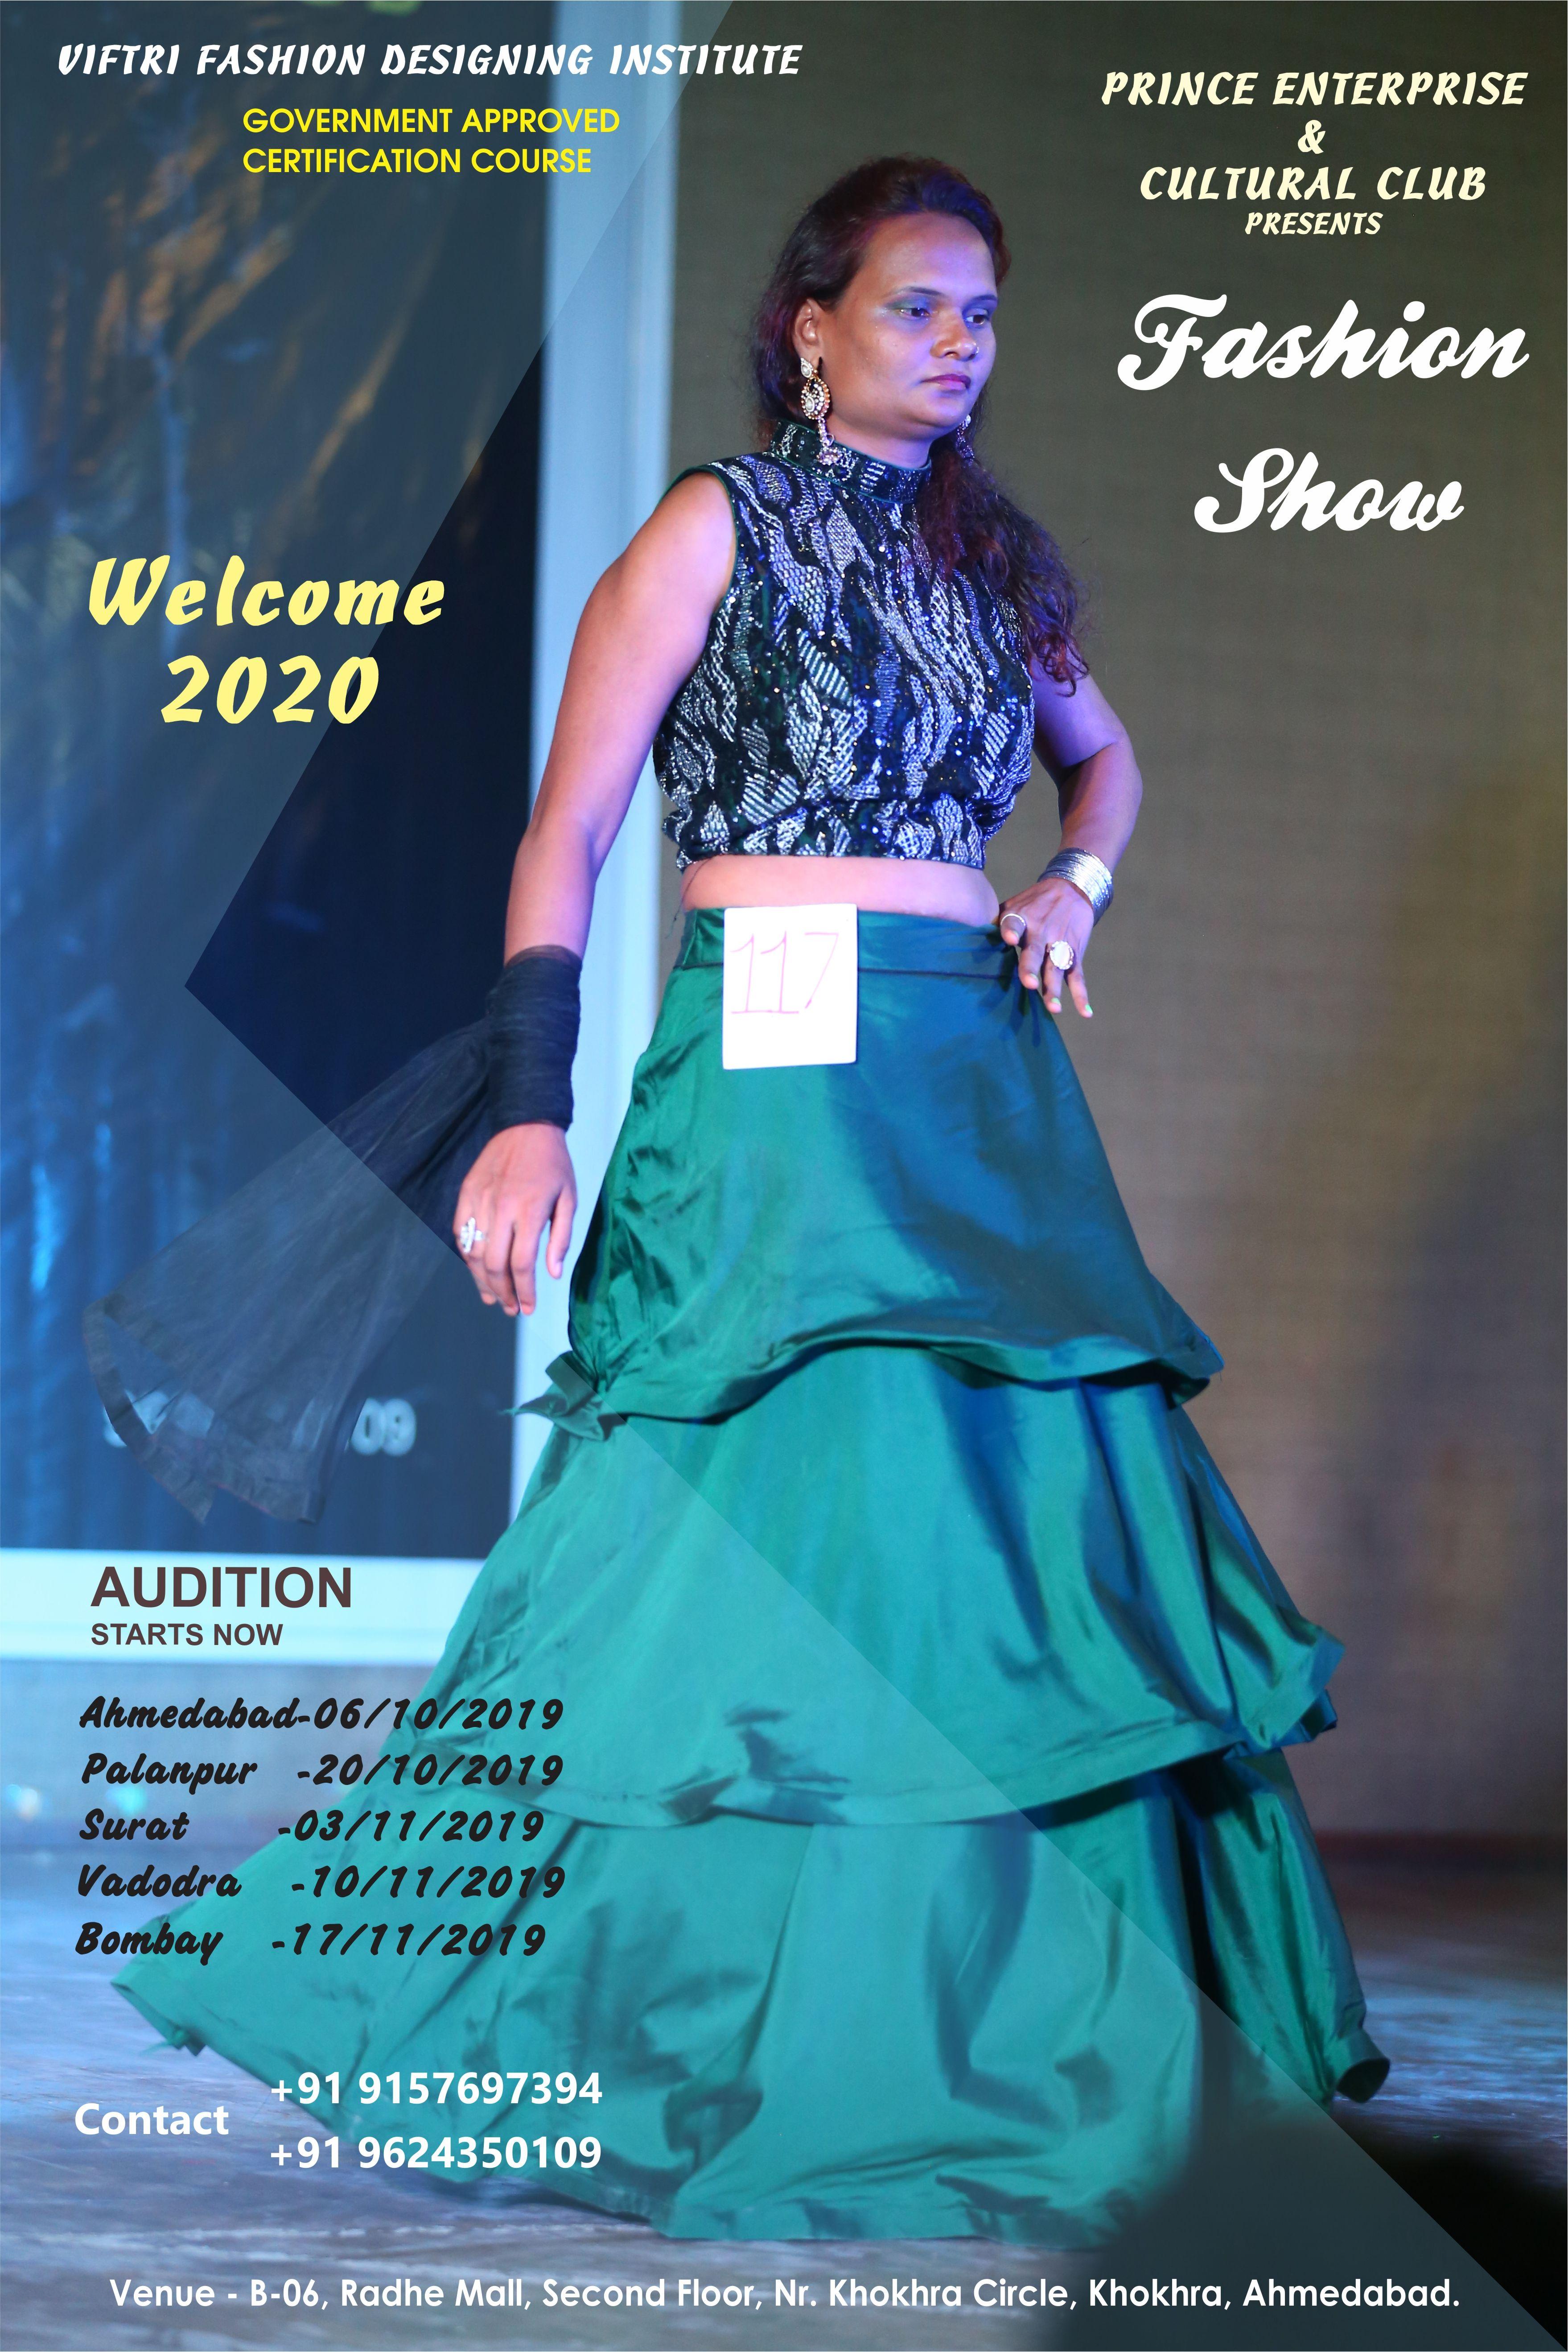 Prince Cultural Club Viftri Fashion Designing Institute Present S Fashion Show 2019 Multi Talent Fashion Designing Institute Fashion Design Fashion Show